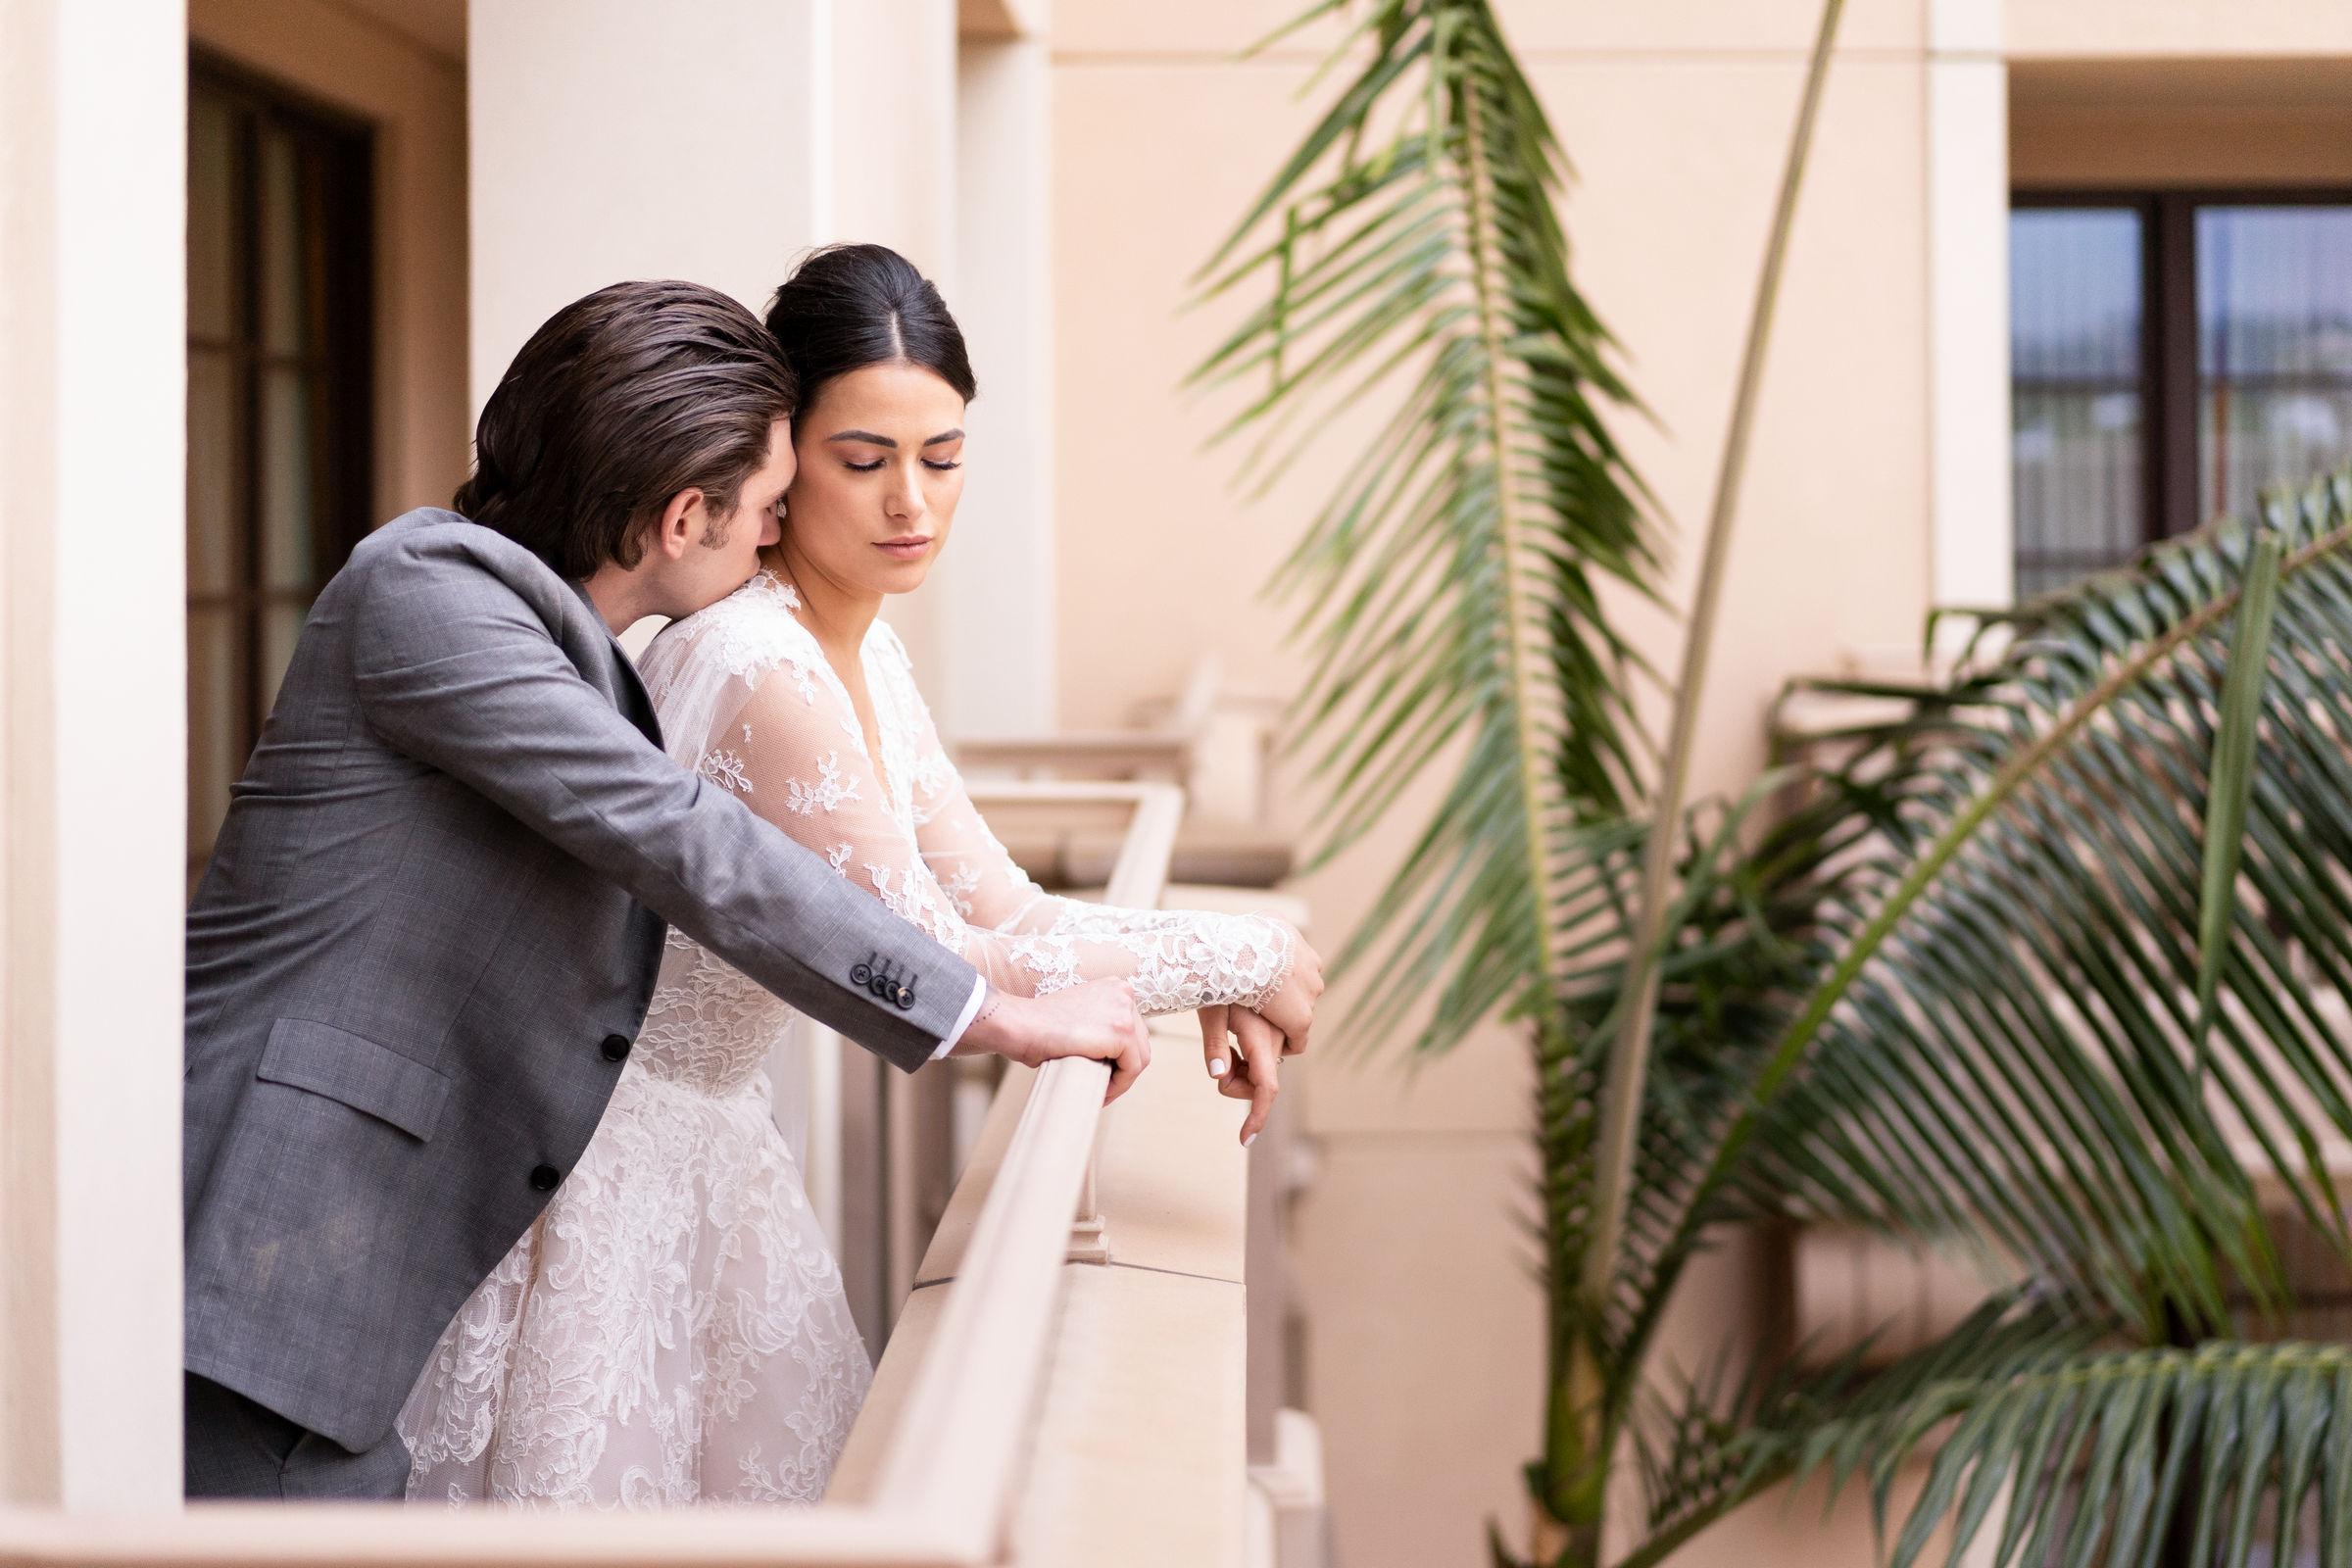 maria-eduardo-montage-beverly-hills-wedding-198.jpg